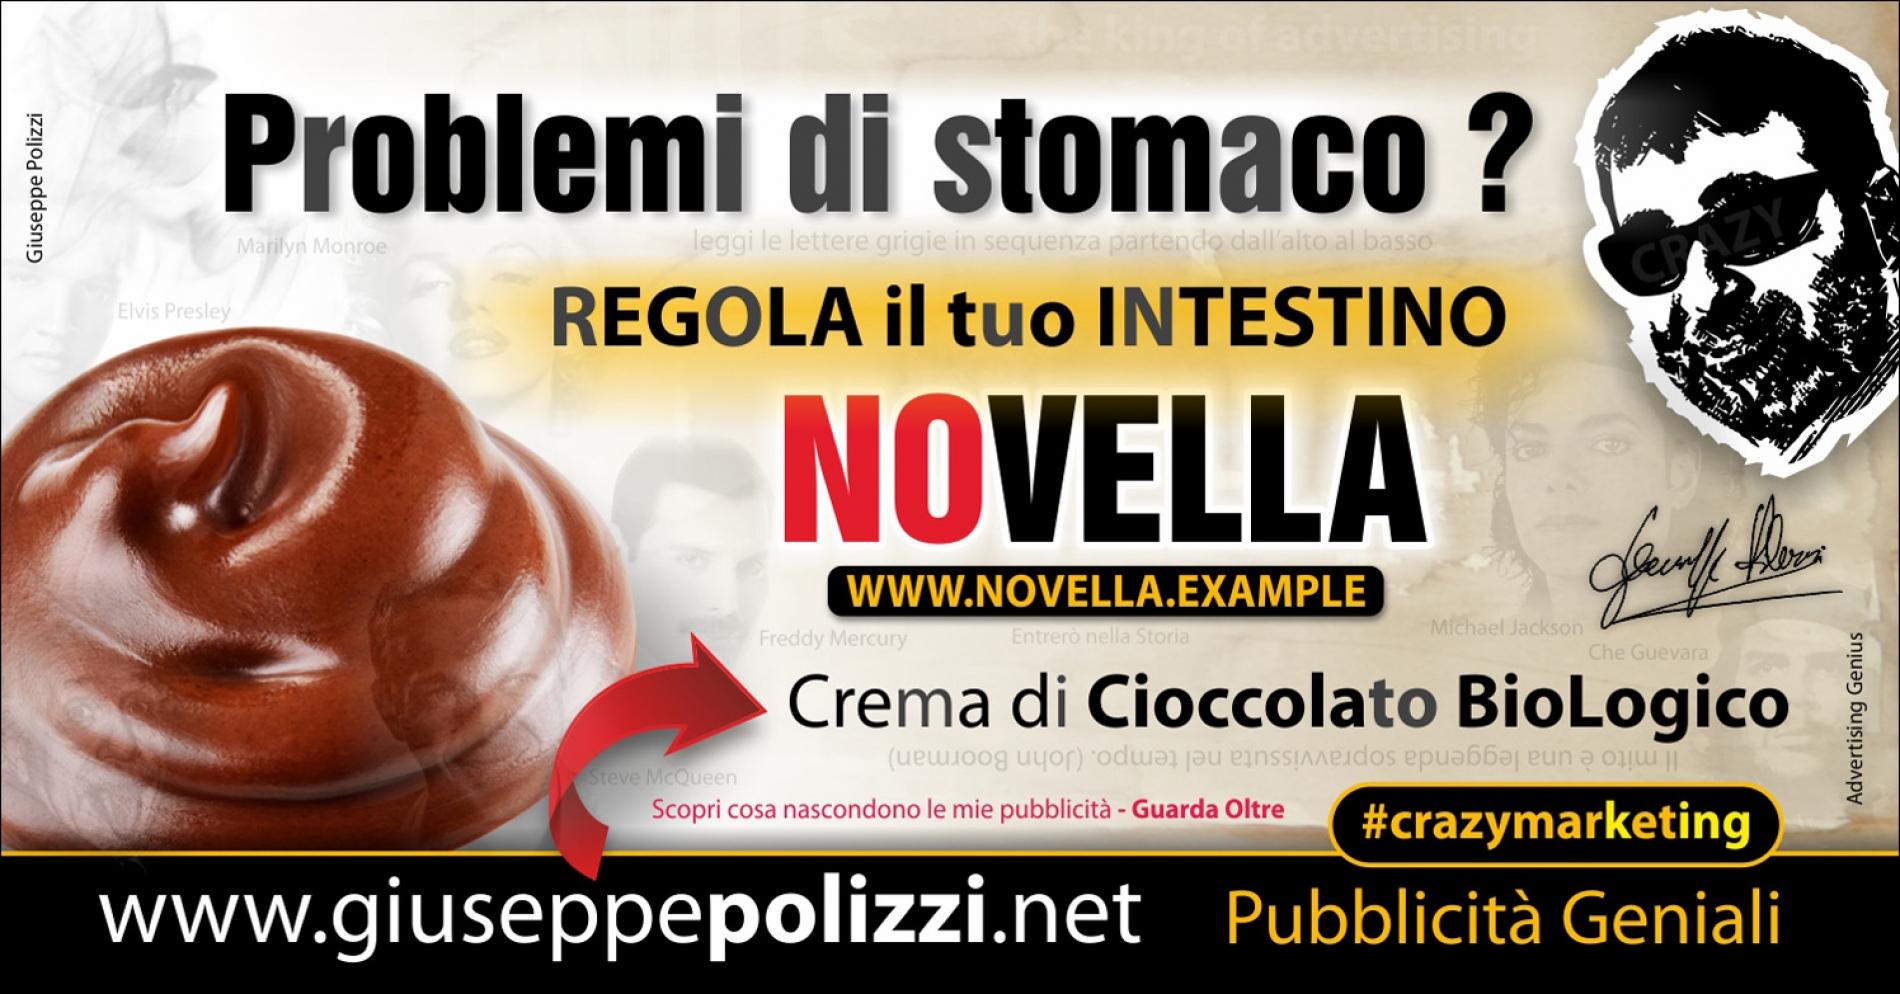 giuseppe Polizzi pubblicita NOvella crazymarketing genius